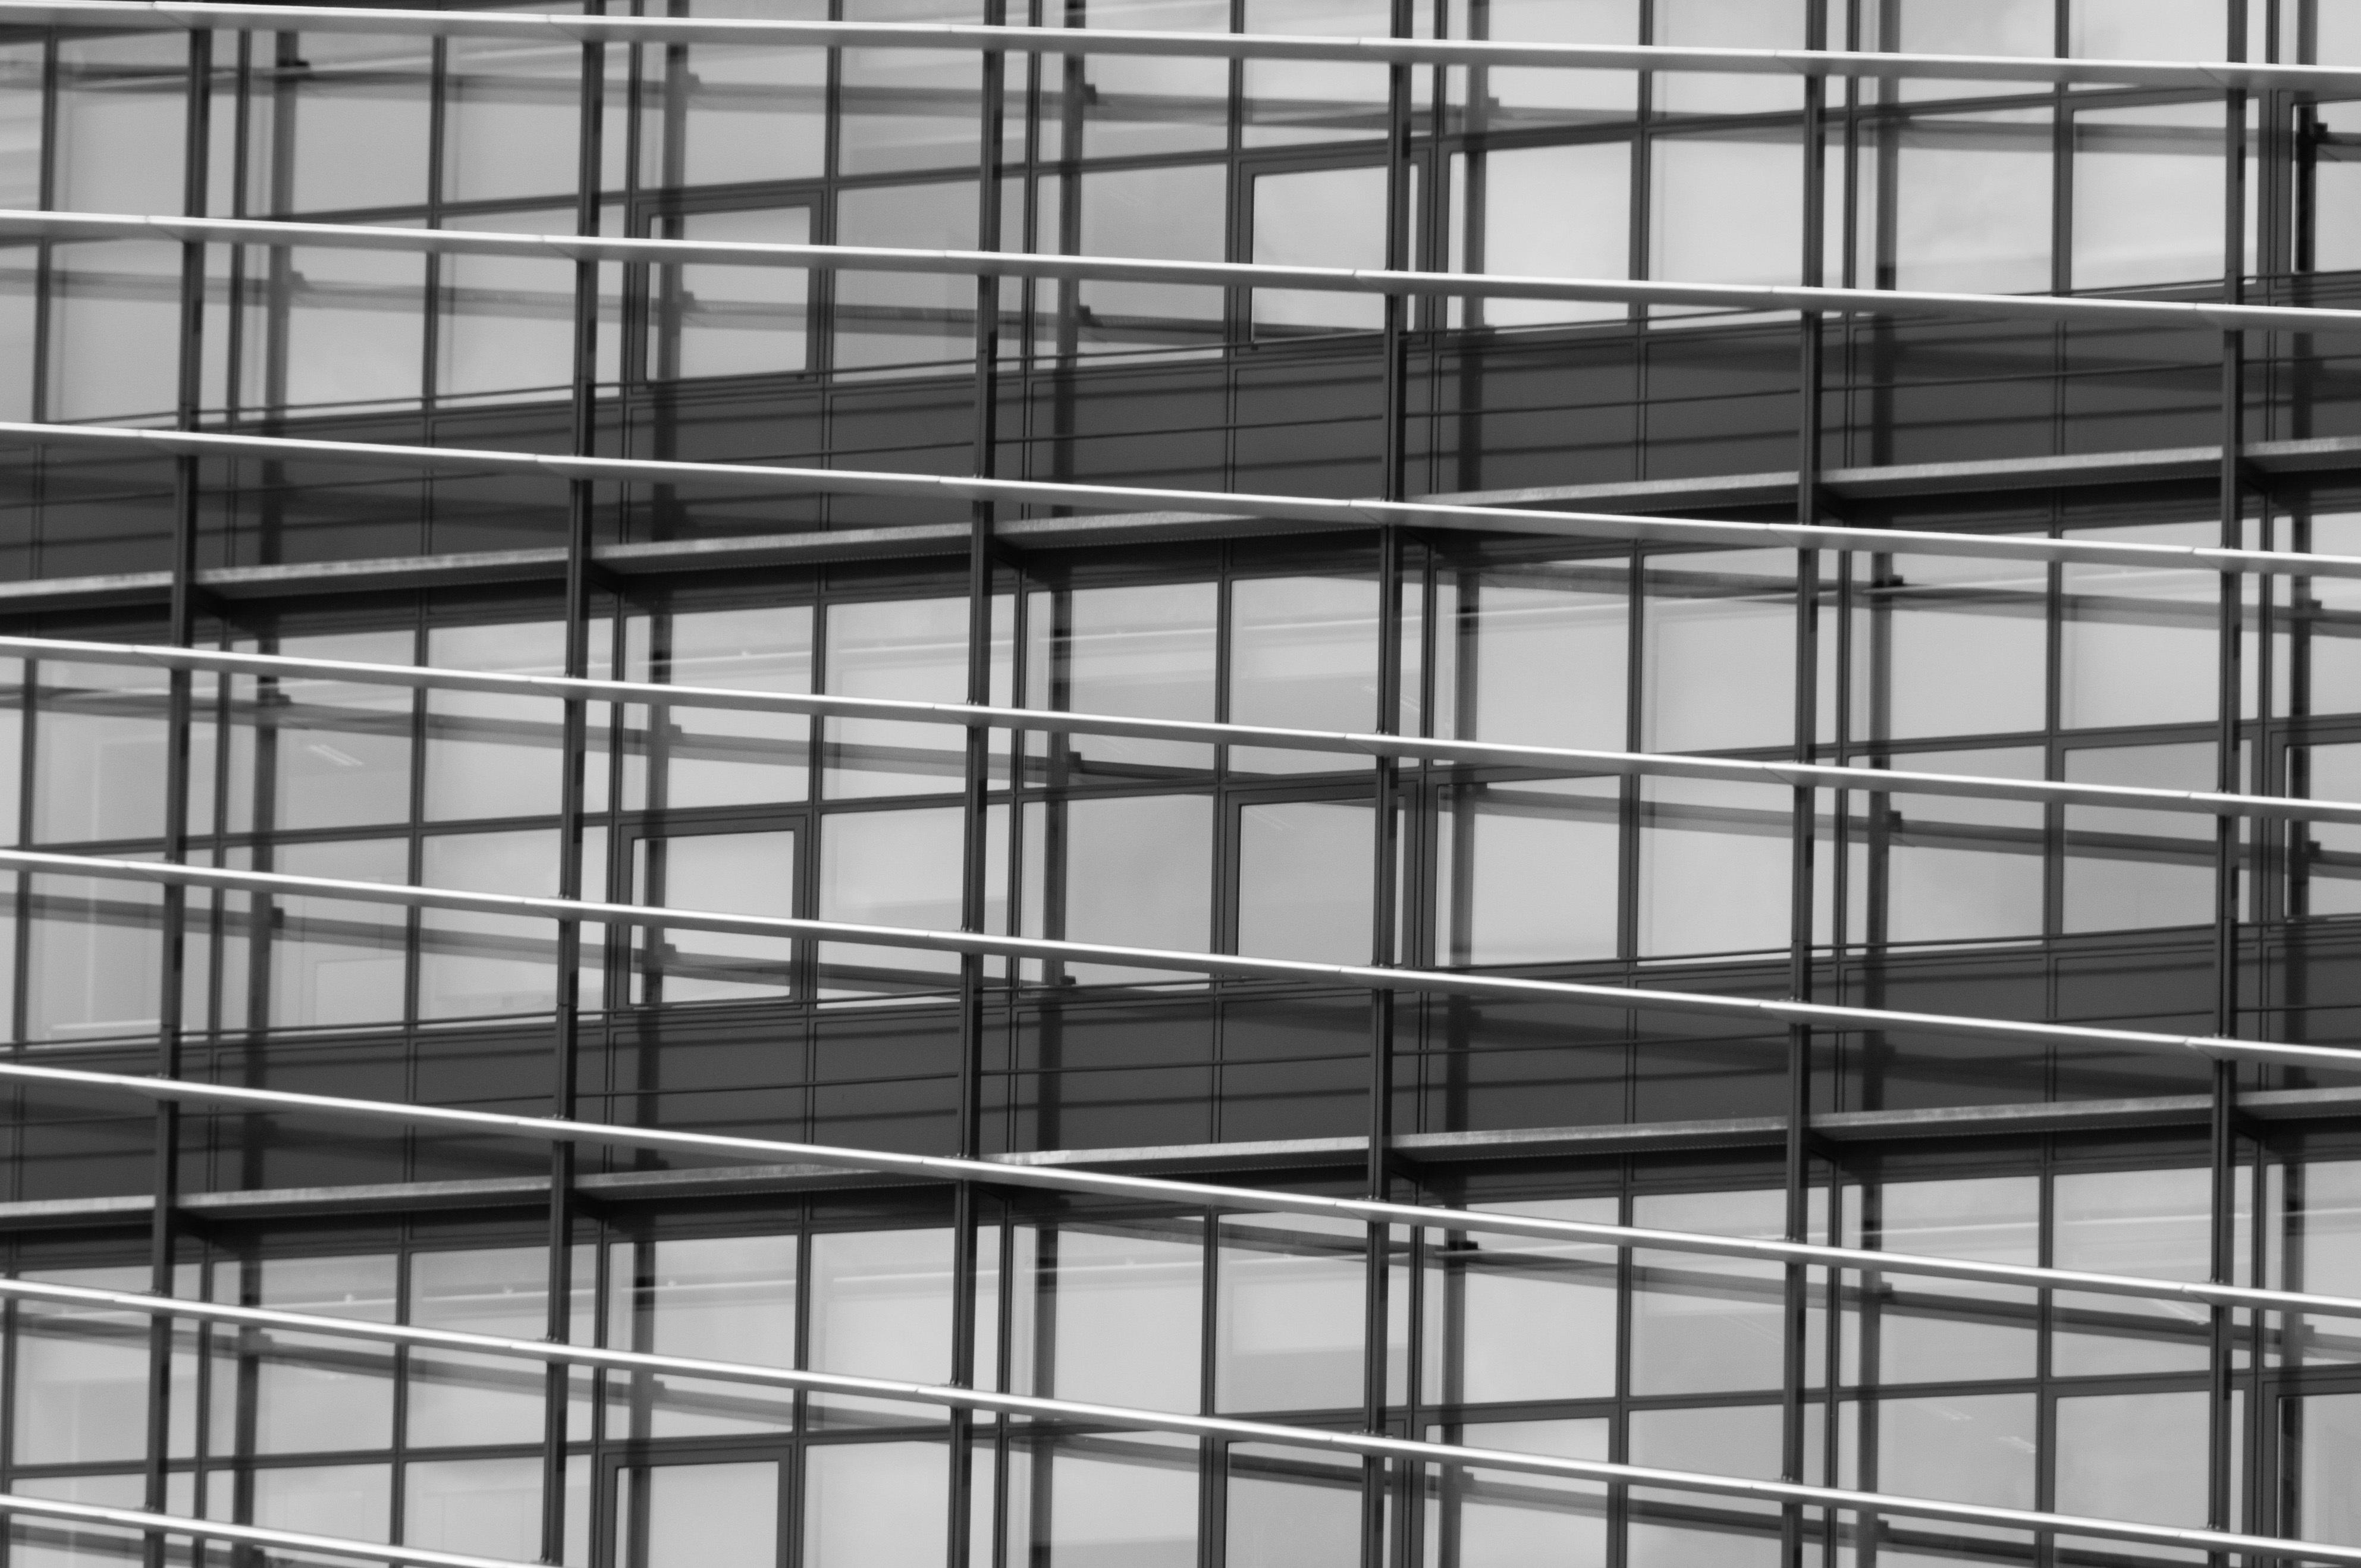 Symmetry Furniture free images : architecture, building, line, metal, facade, shelf